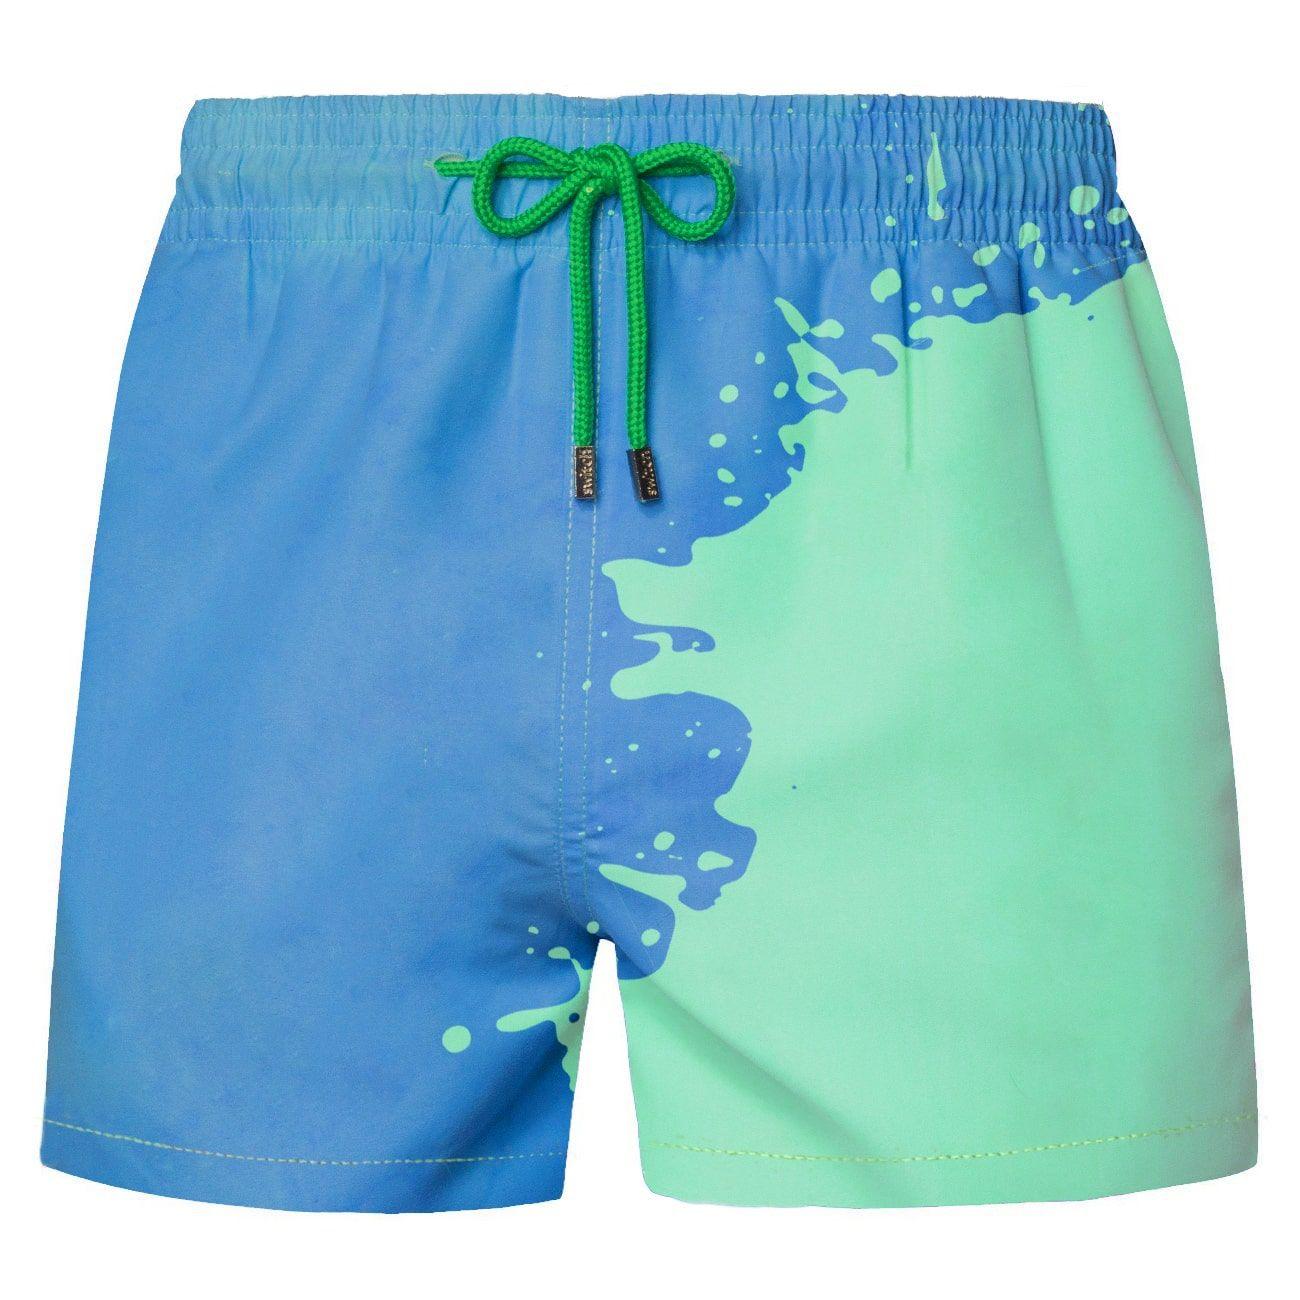 Men Color Changing Swim Trunks Bathing Shorts Beach Swiming Shorts Beach  Pants.